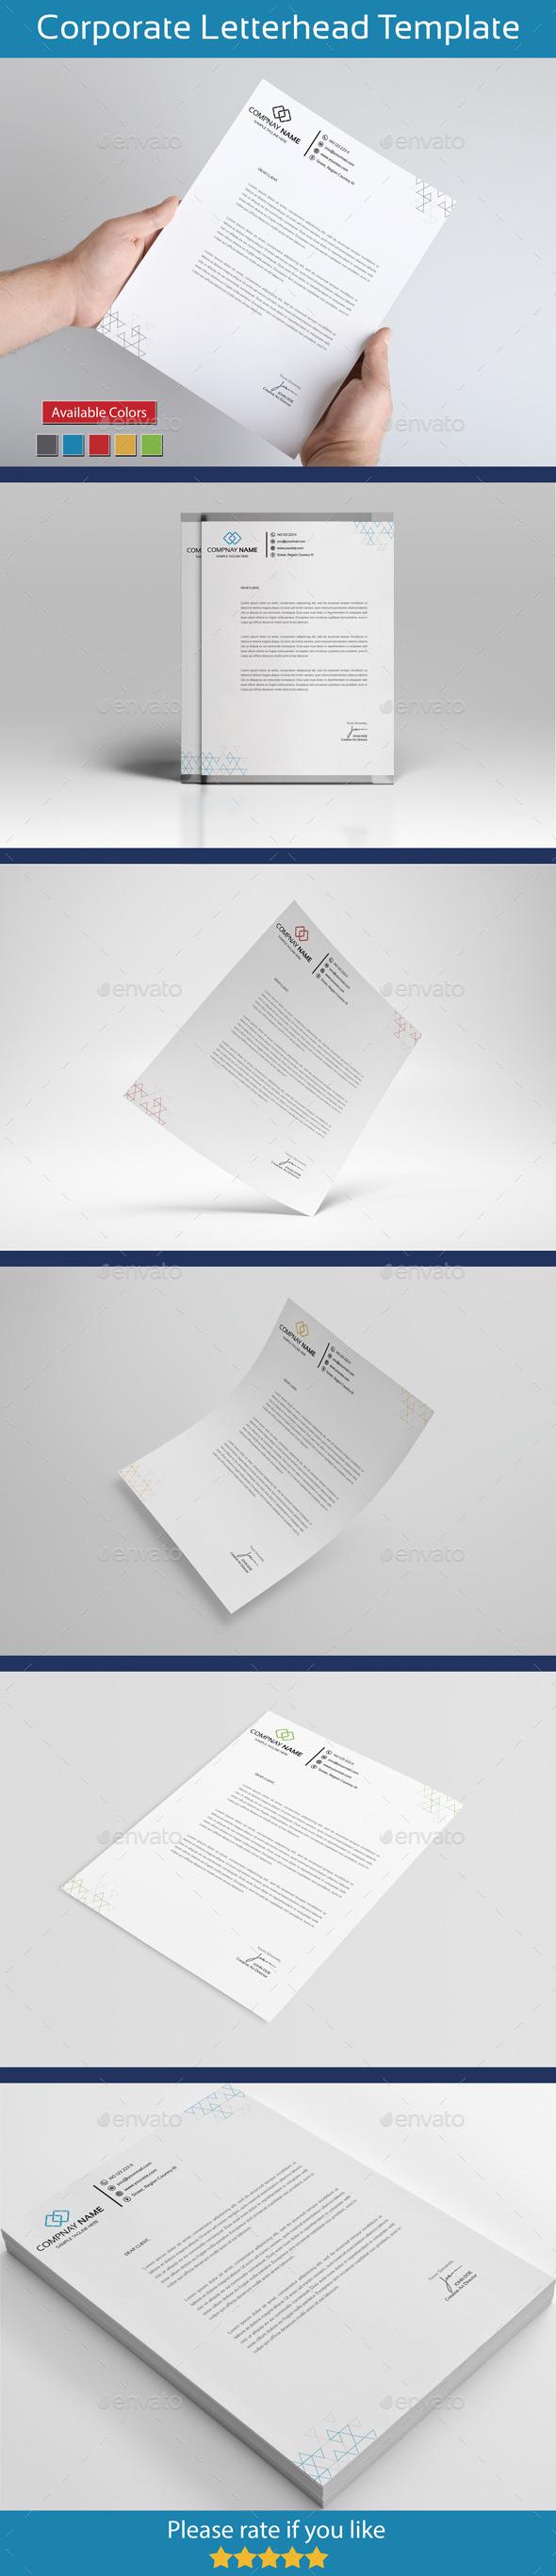 Global Letterhead - Stationery Print Templates